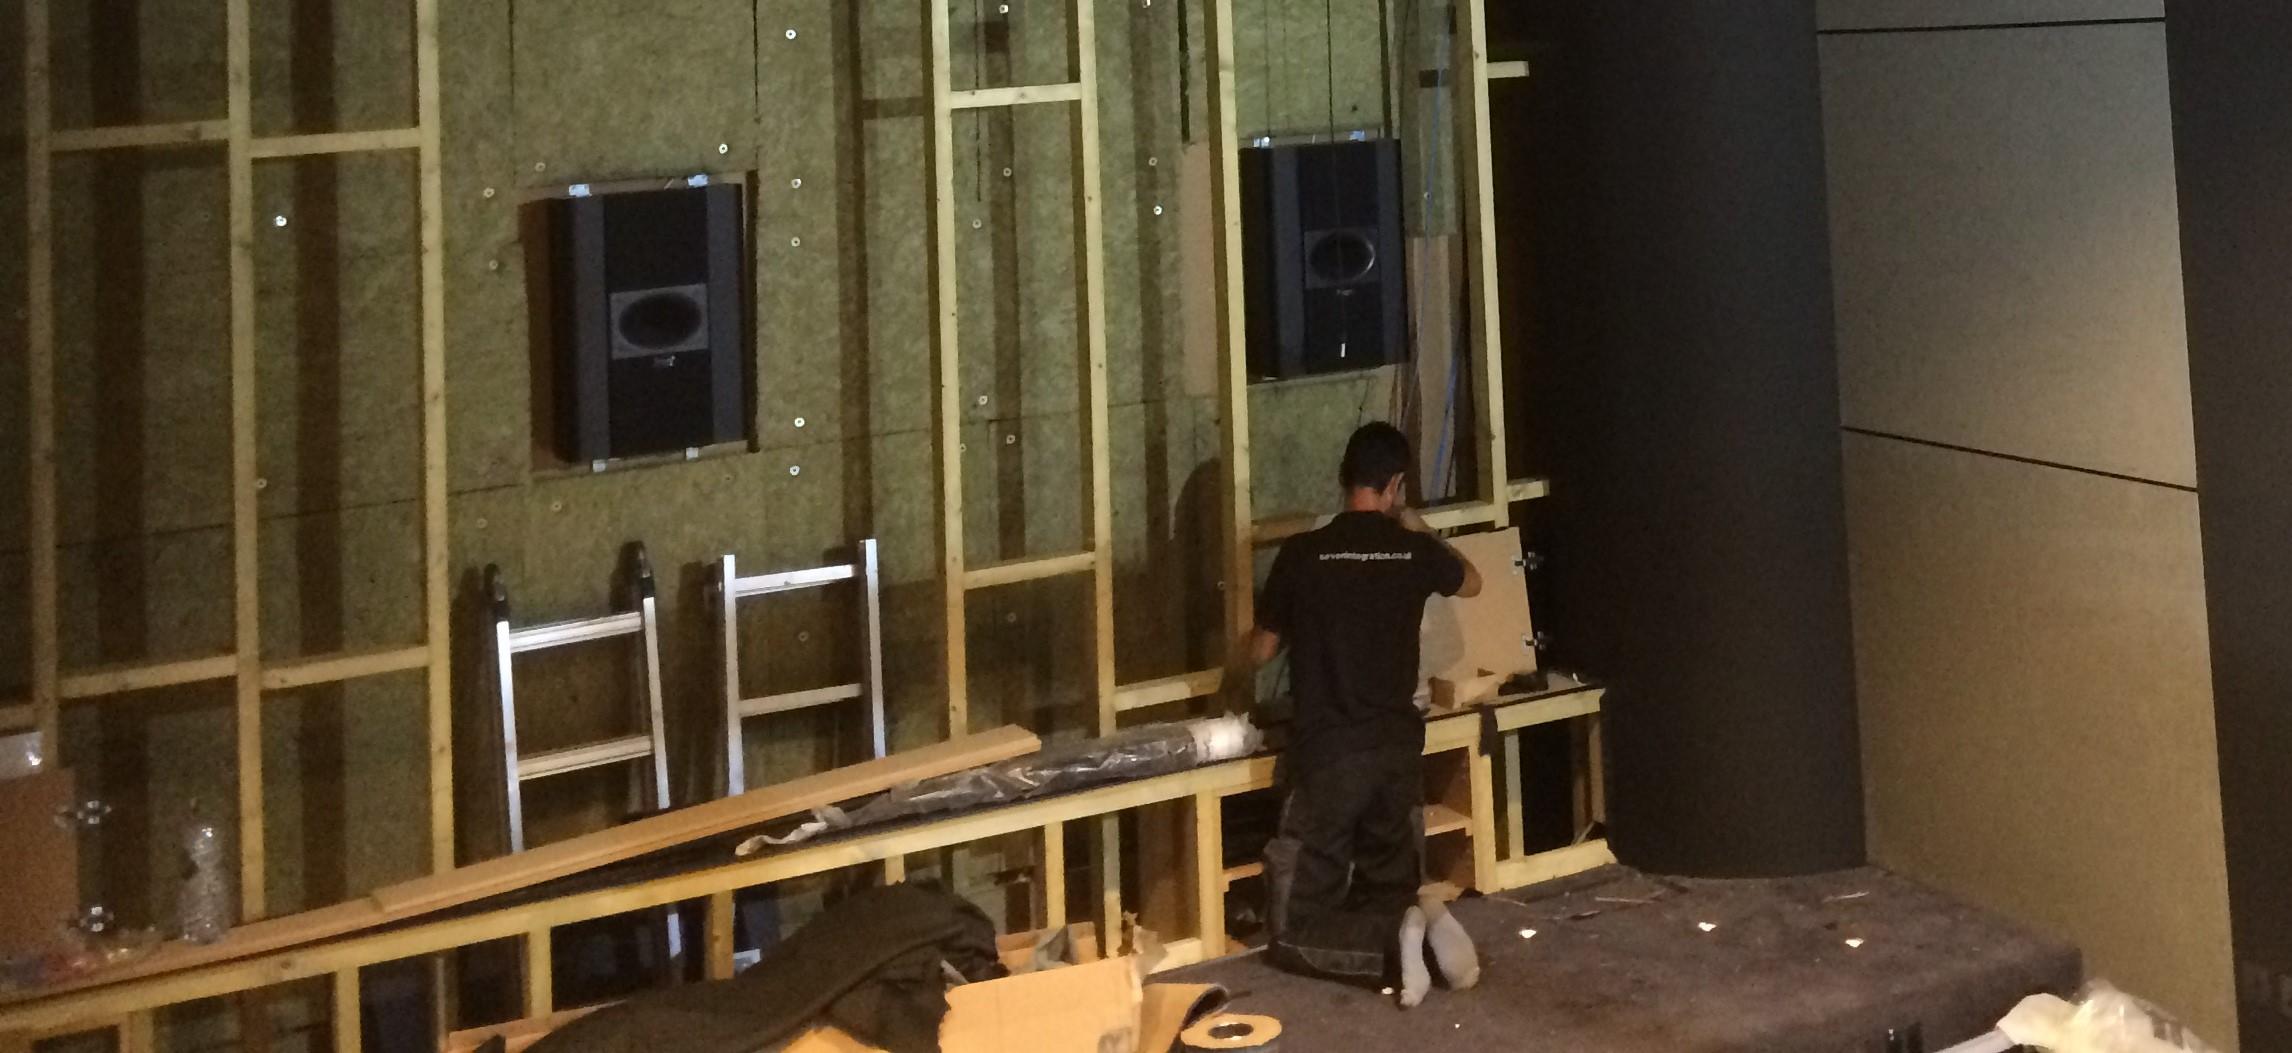 Home Cinema Baffle Wall - What? Why? How?